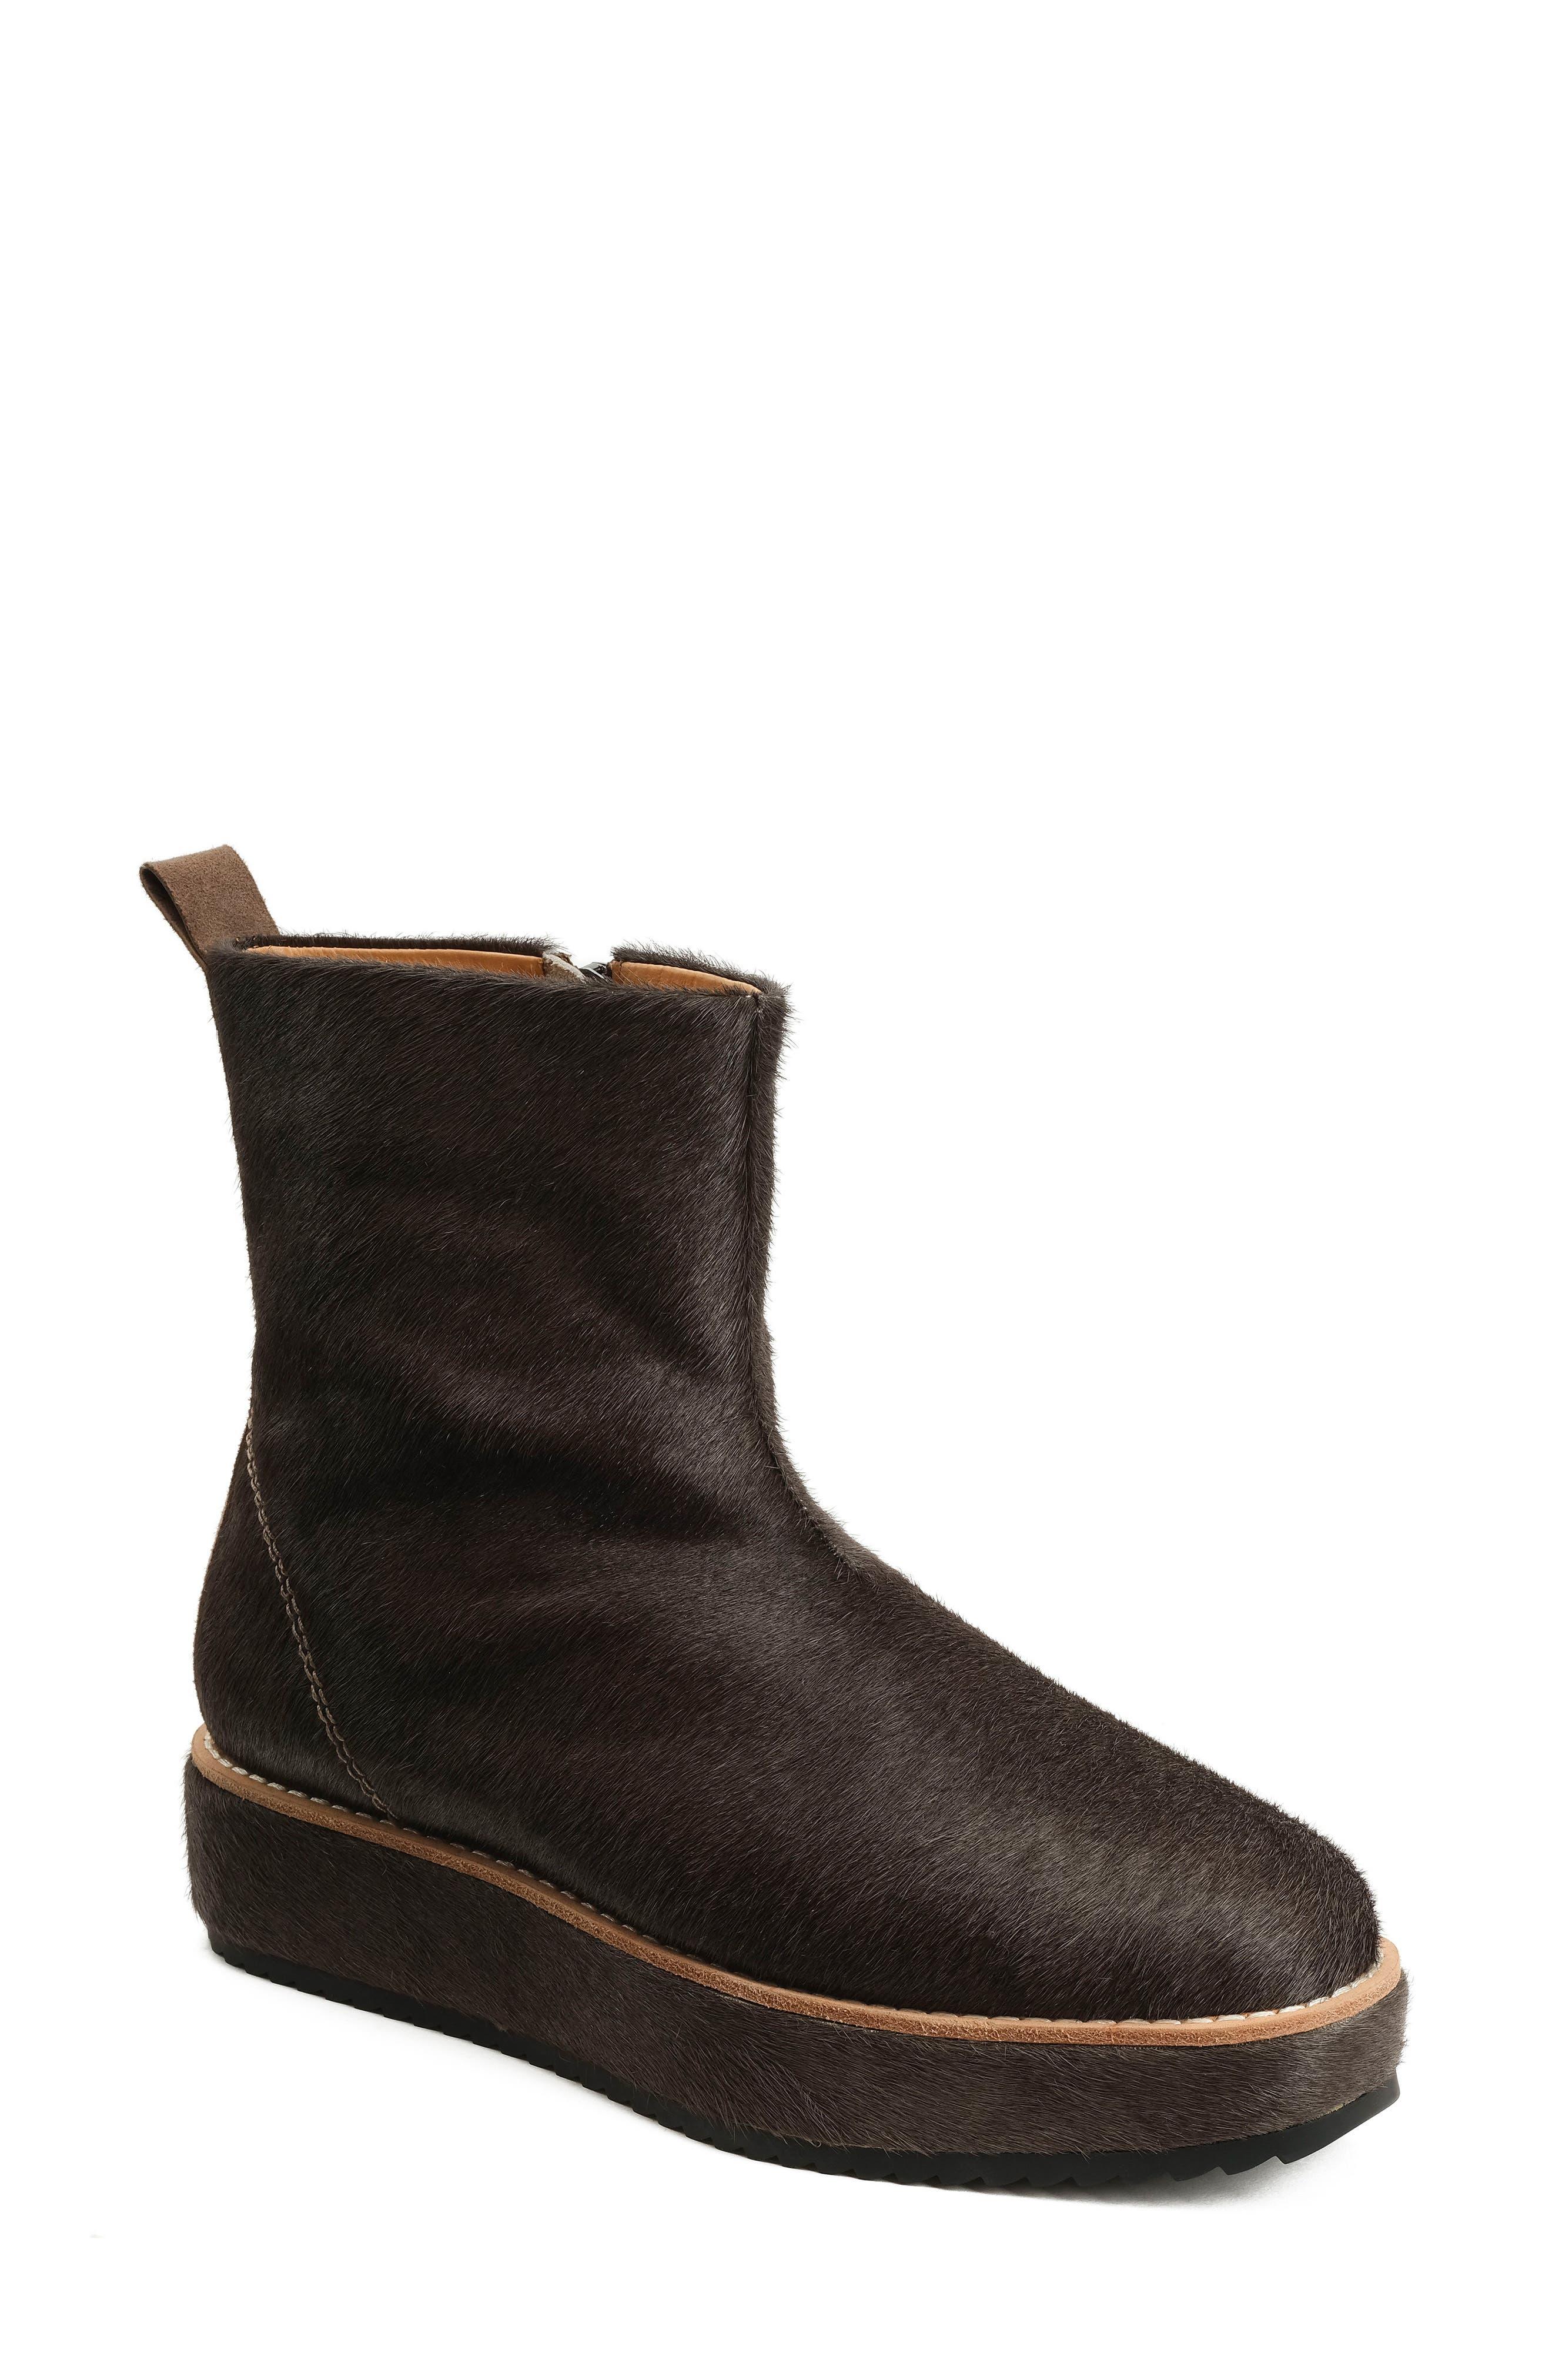 Penny Sutton Genuine Calf Hair Boot,                         Main,                         color, Mushroom Haircalf